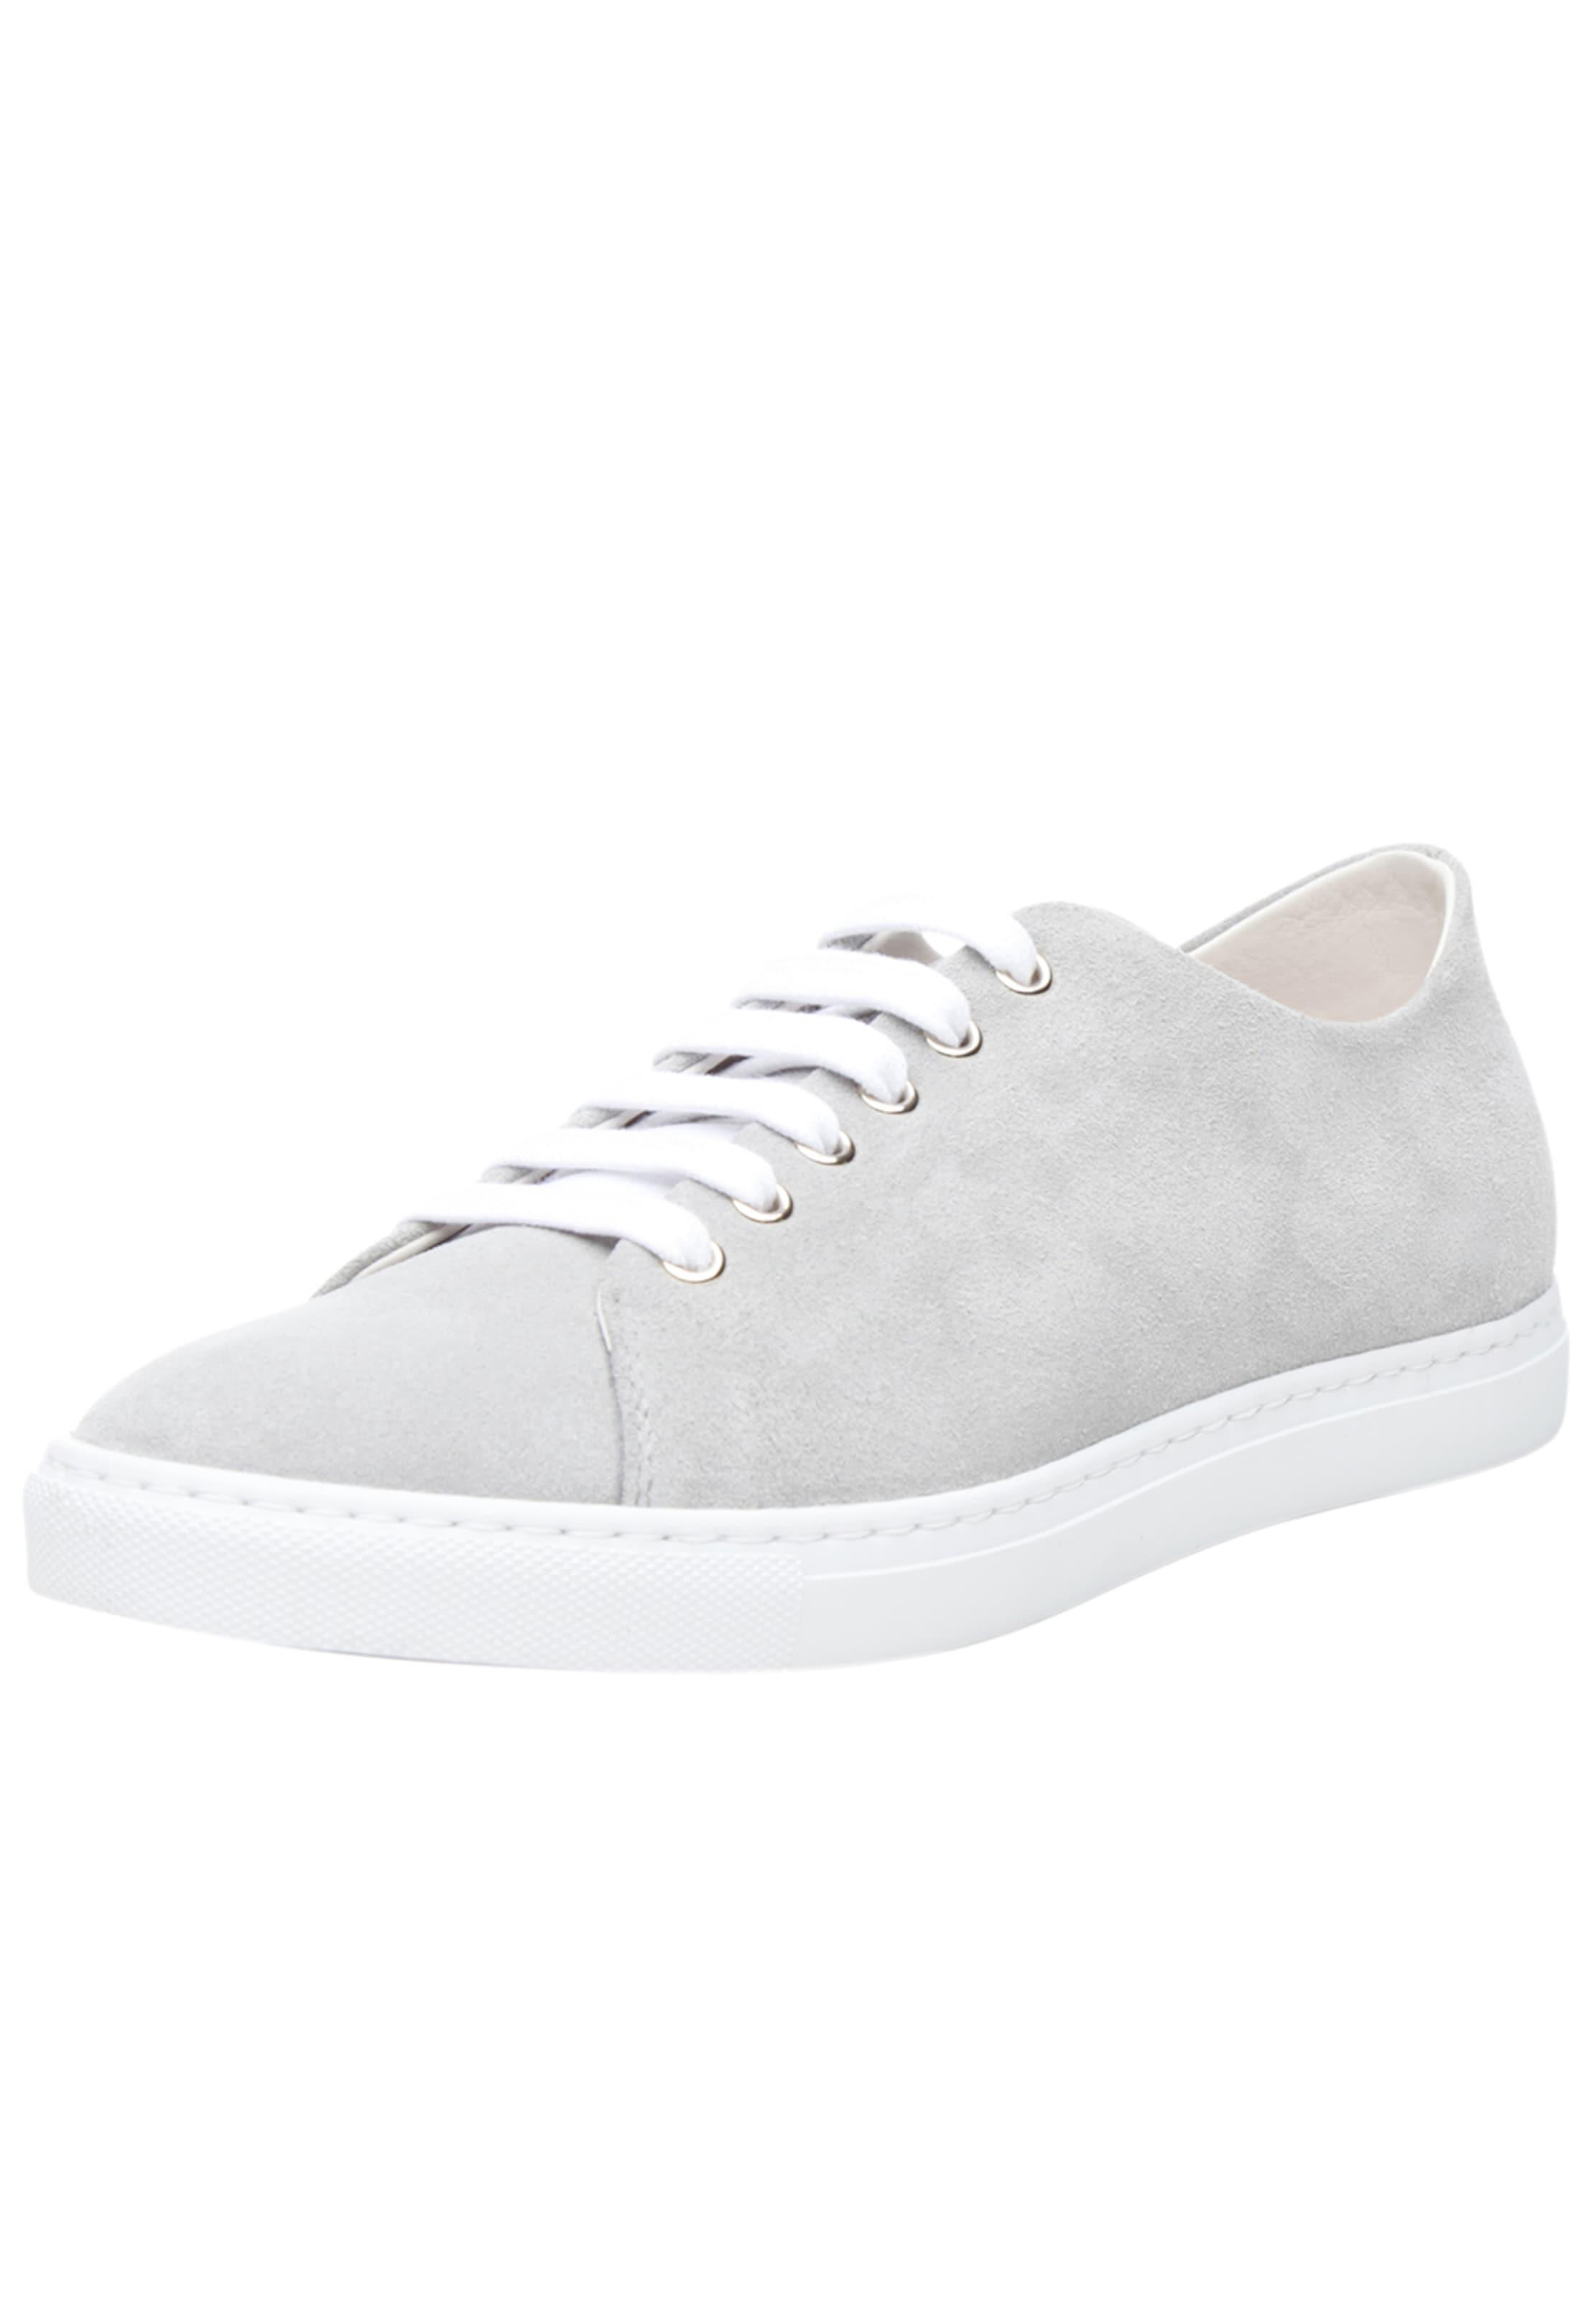 'no31 Ws' Sneaker In Grau Shoepassion 4ARcSjL35q